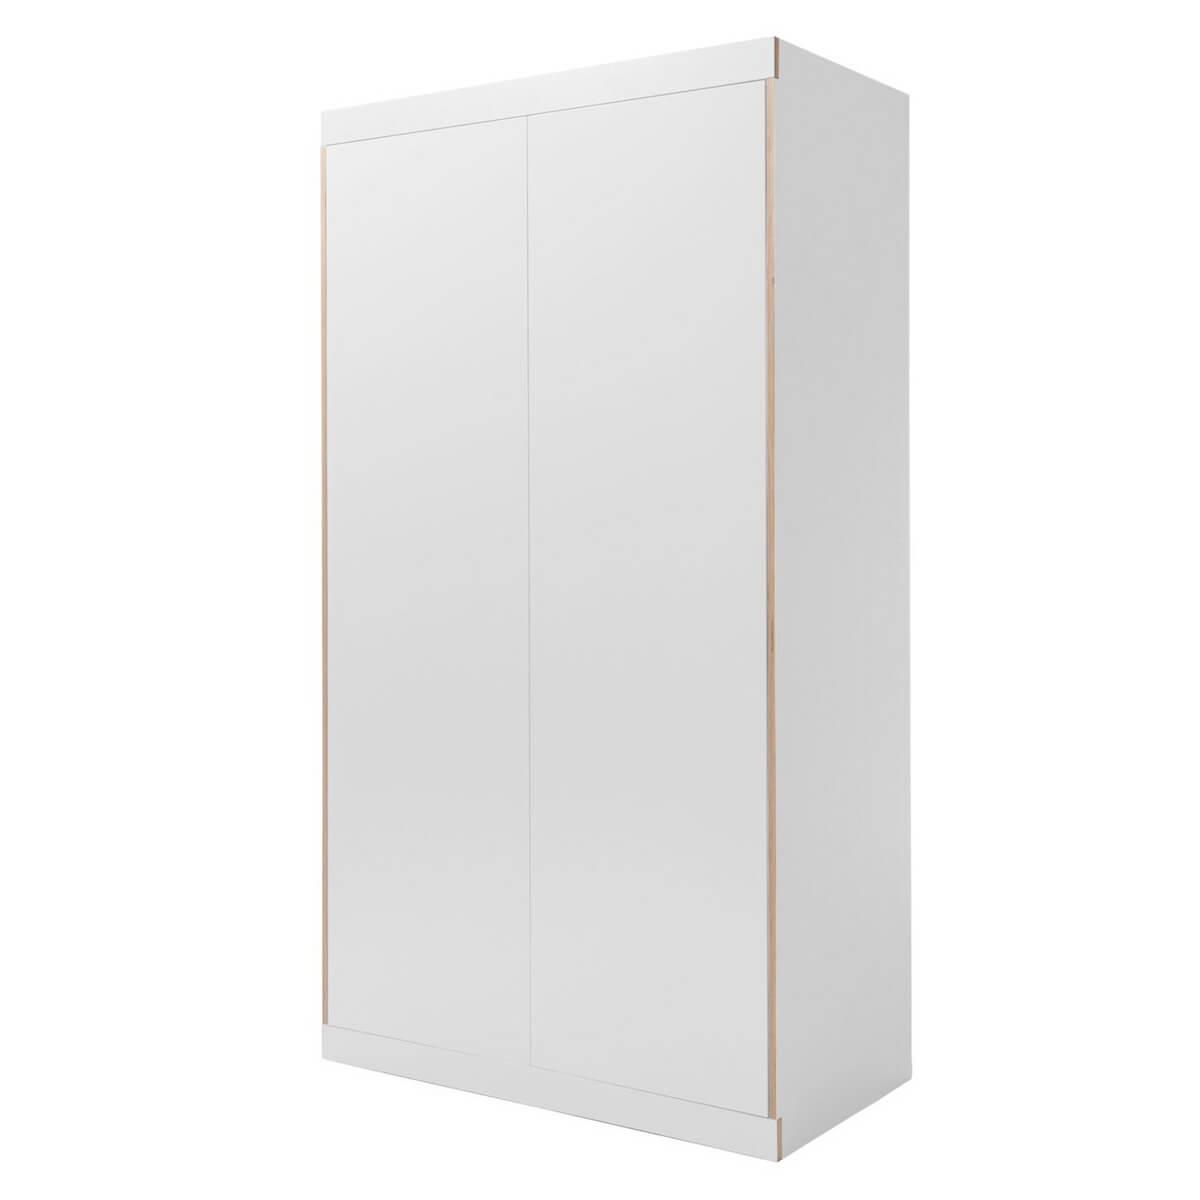 Armoire 2 portes FLAI Mueller bord blanc-bouleau